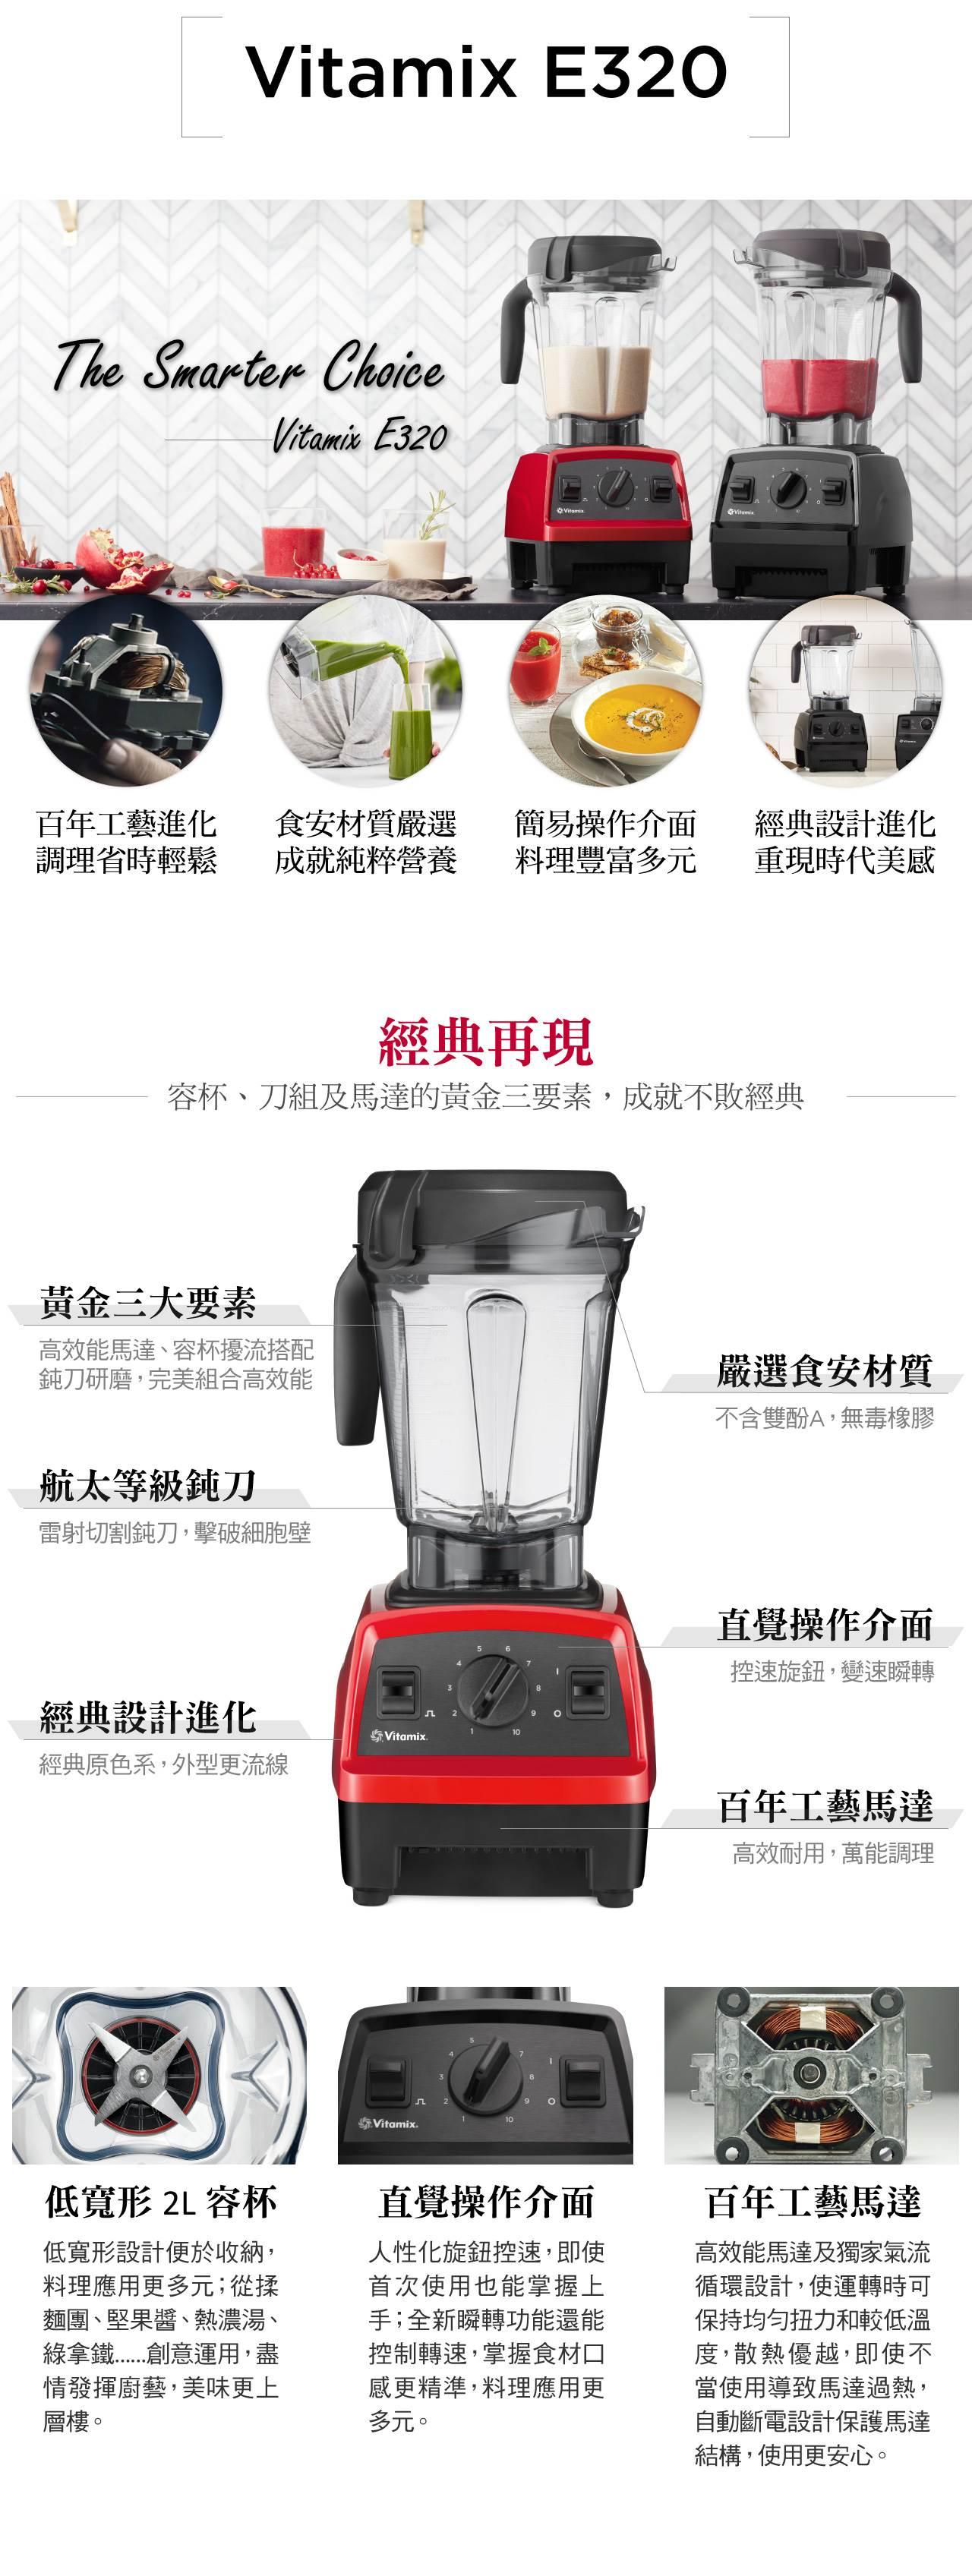 Vitamix-E320調理機-產品特色與經典再現